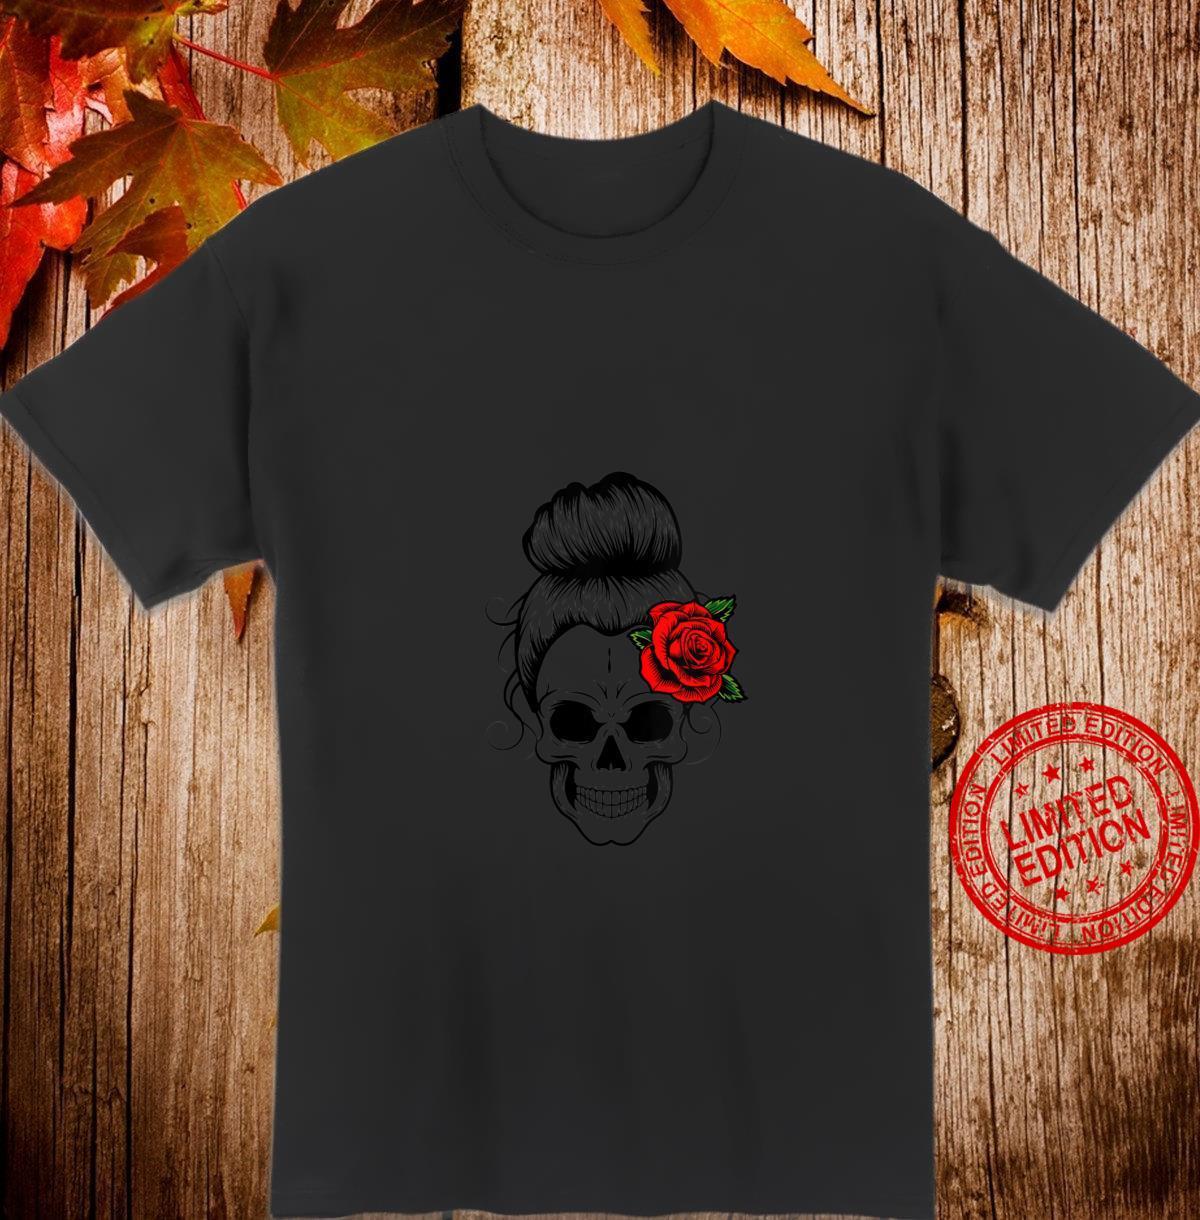 Womens Messy Bun Skull Shirt's Muertos Halloween Shirt Group Shirt